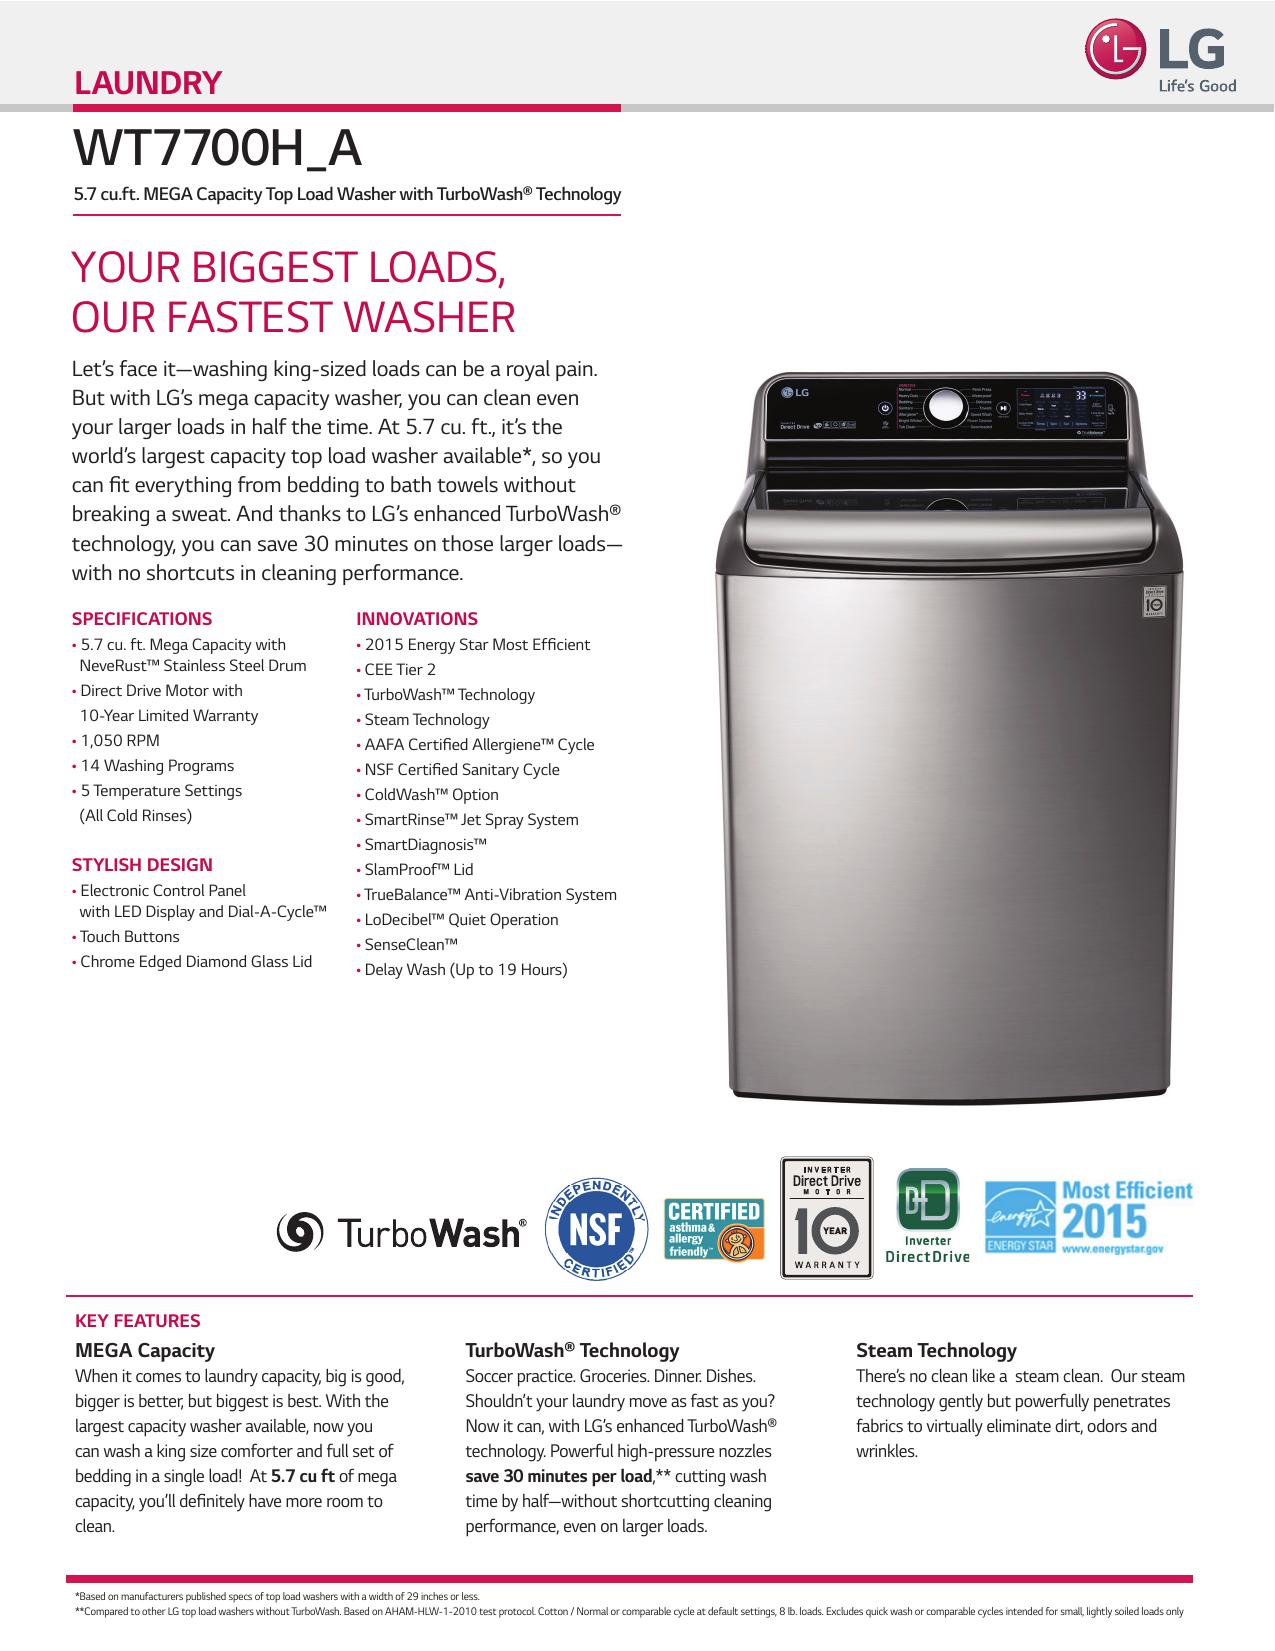 LG WT7700HWA DOWNLOAD PDF | manualzz com